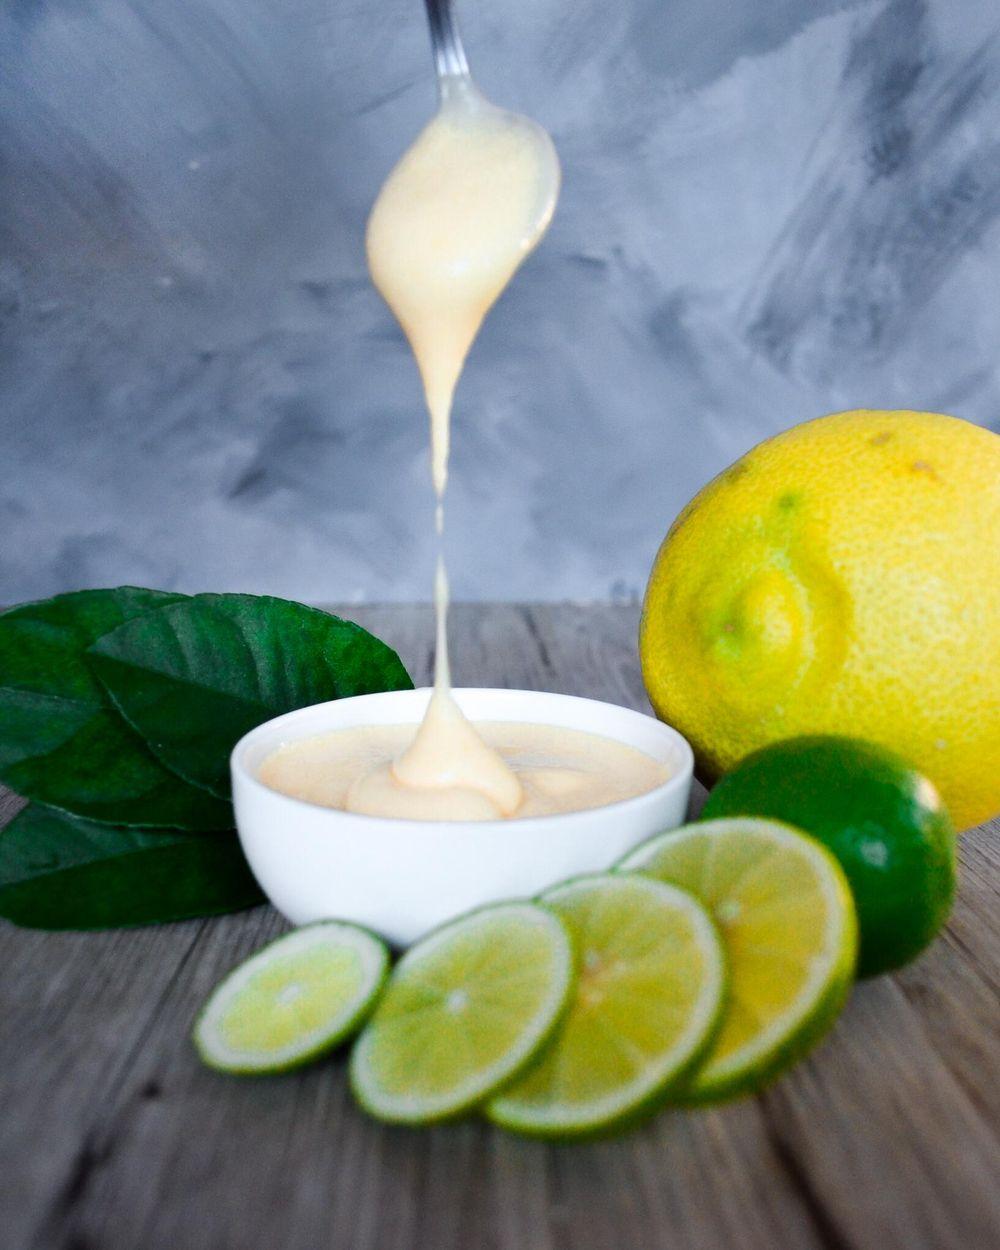 Lemon Lime Curd - image 4 - student project